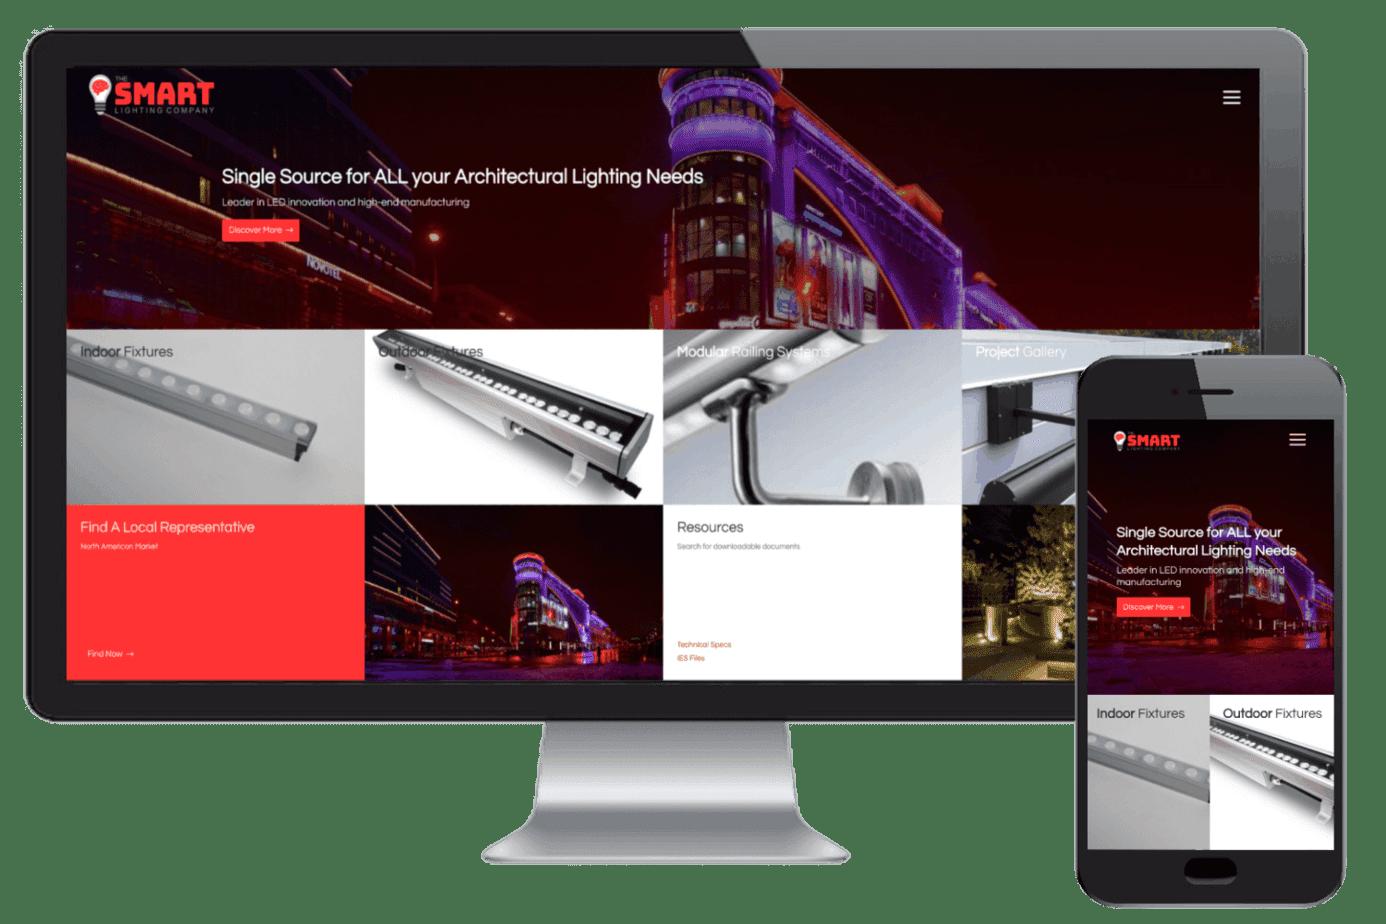 The Smart Lighting Company